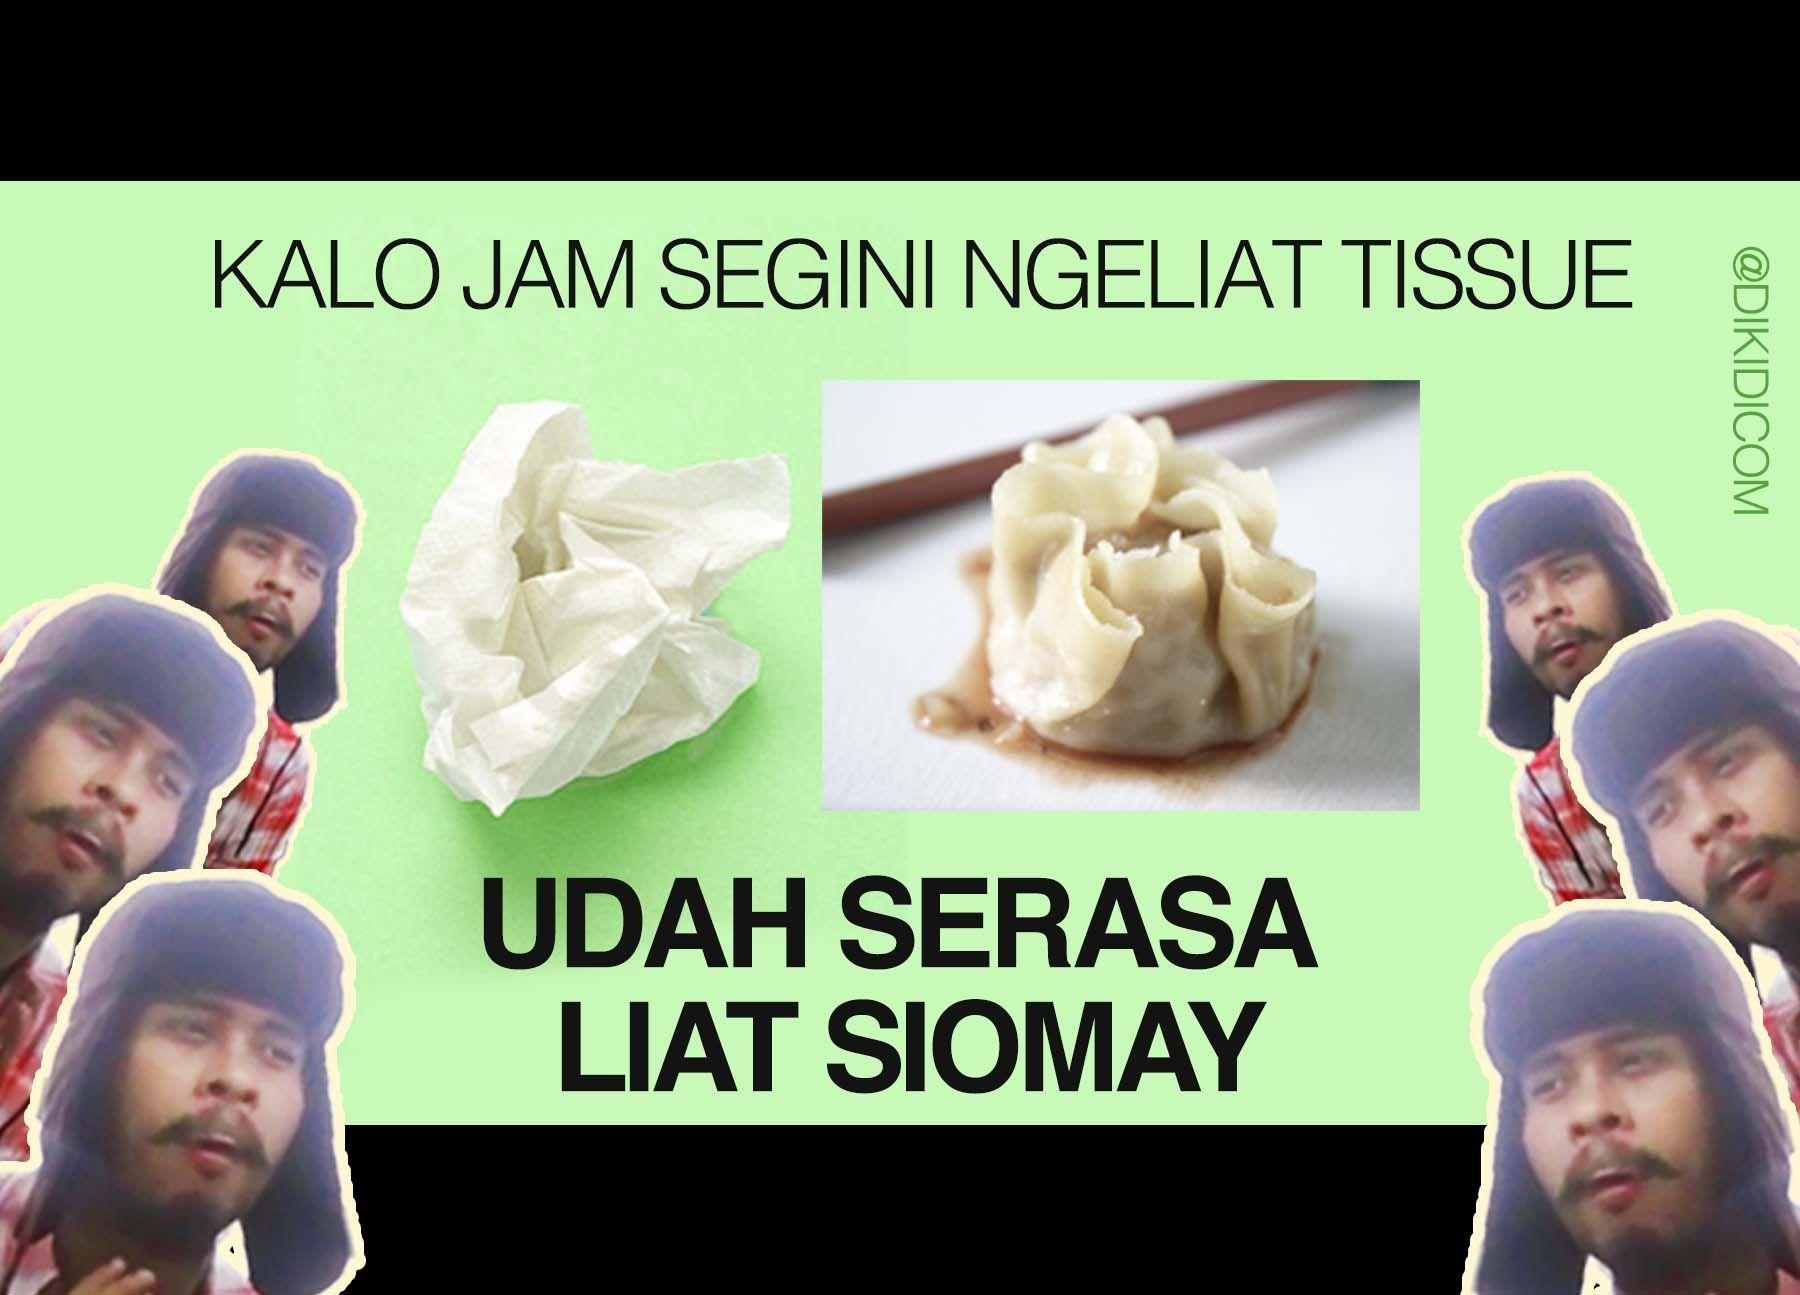 Tissue Rasa Siomay Mau Lebih Cek Dikidicom Meme Indonesia